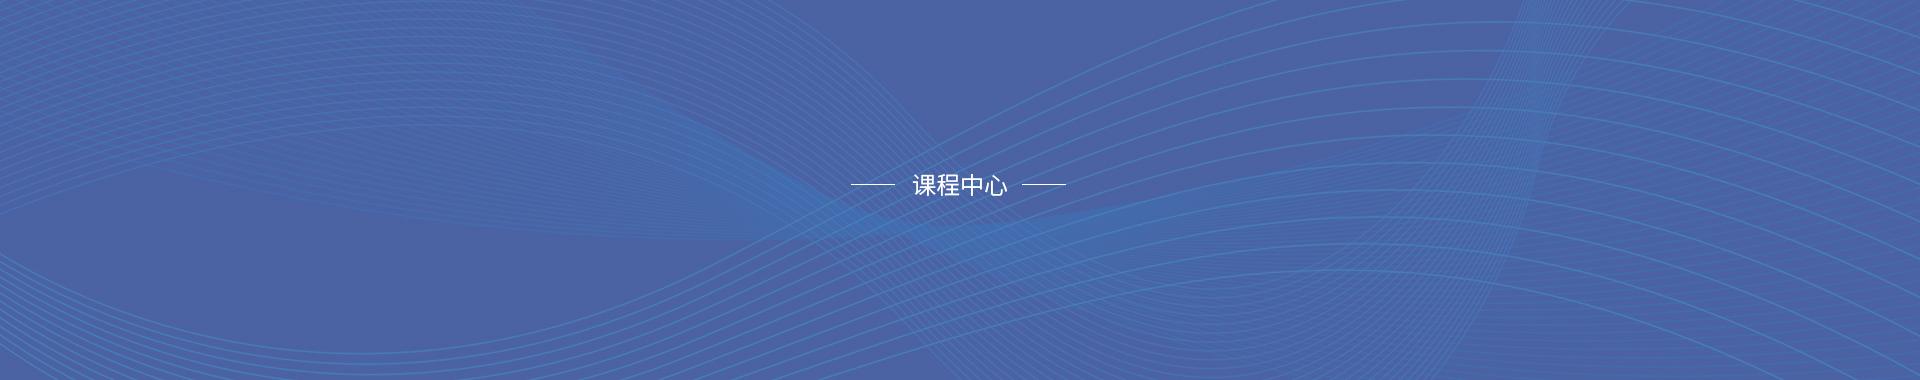 https://www.haishizaixian.com/data/upload/202007/20200718101130_172.jpg